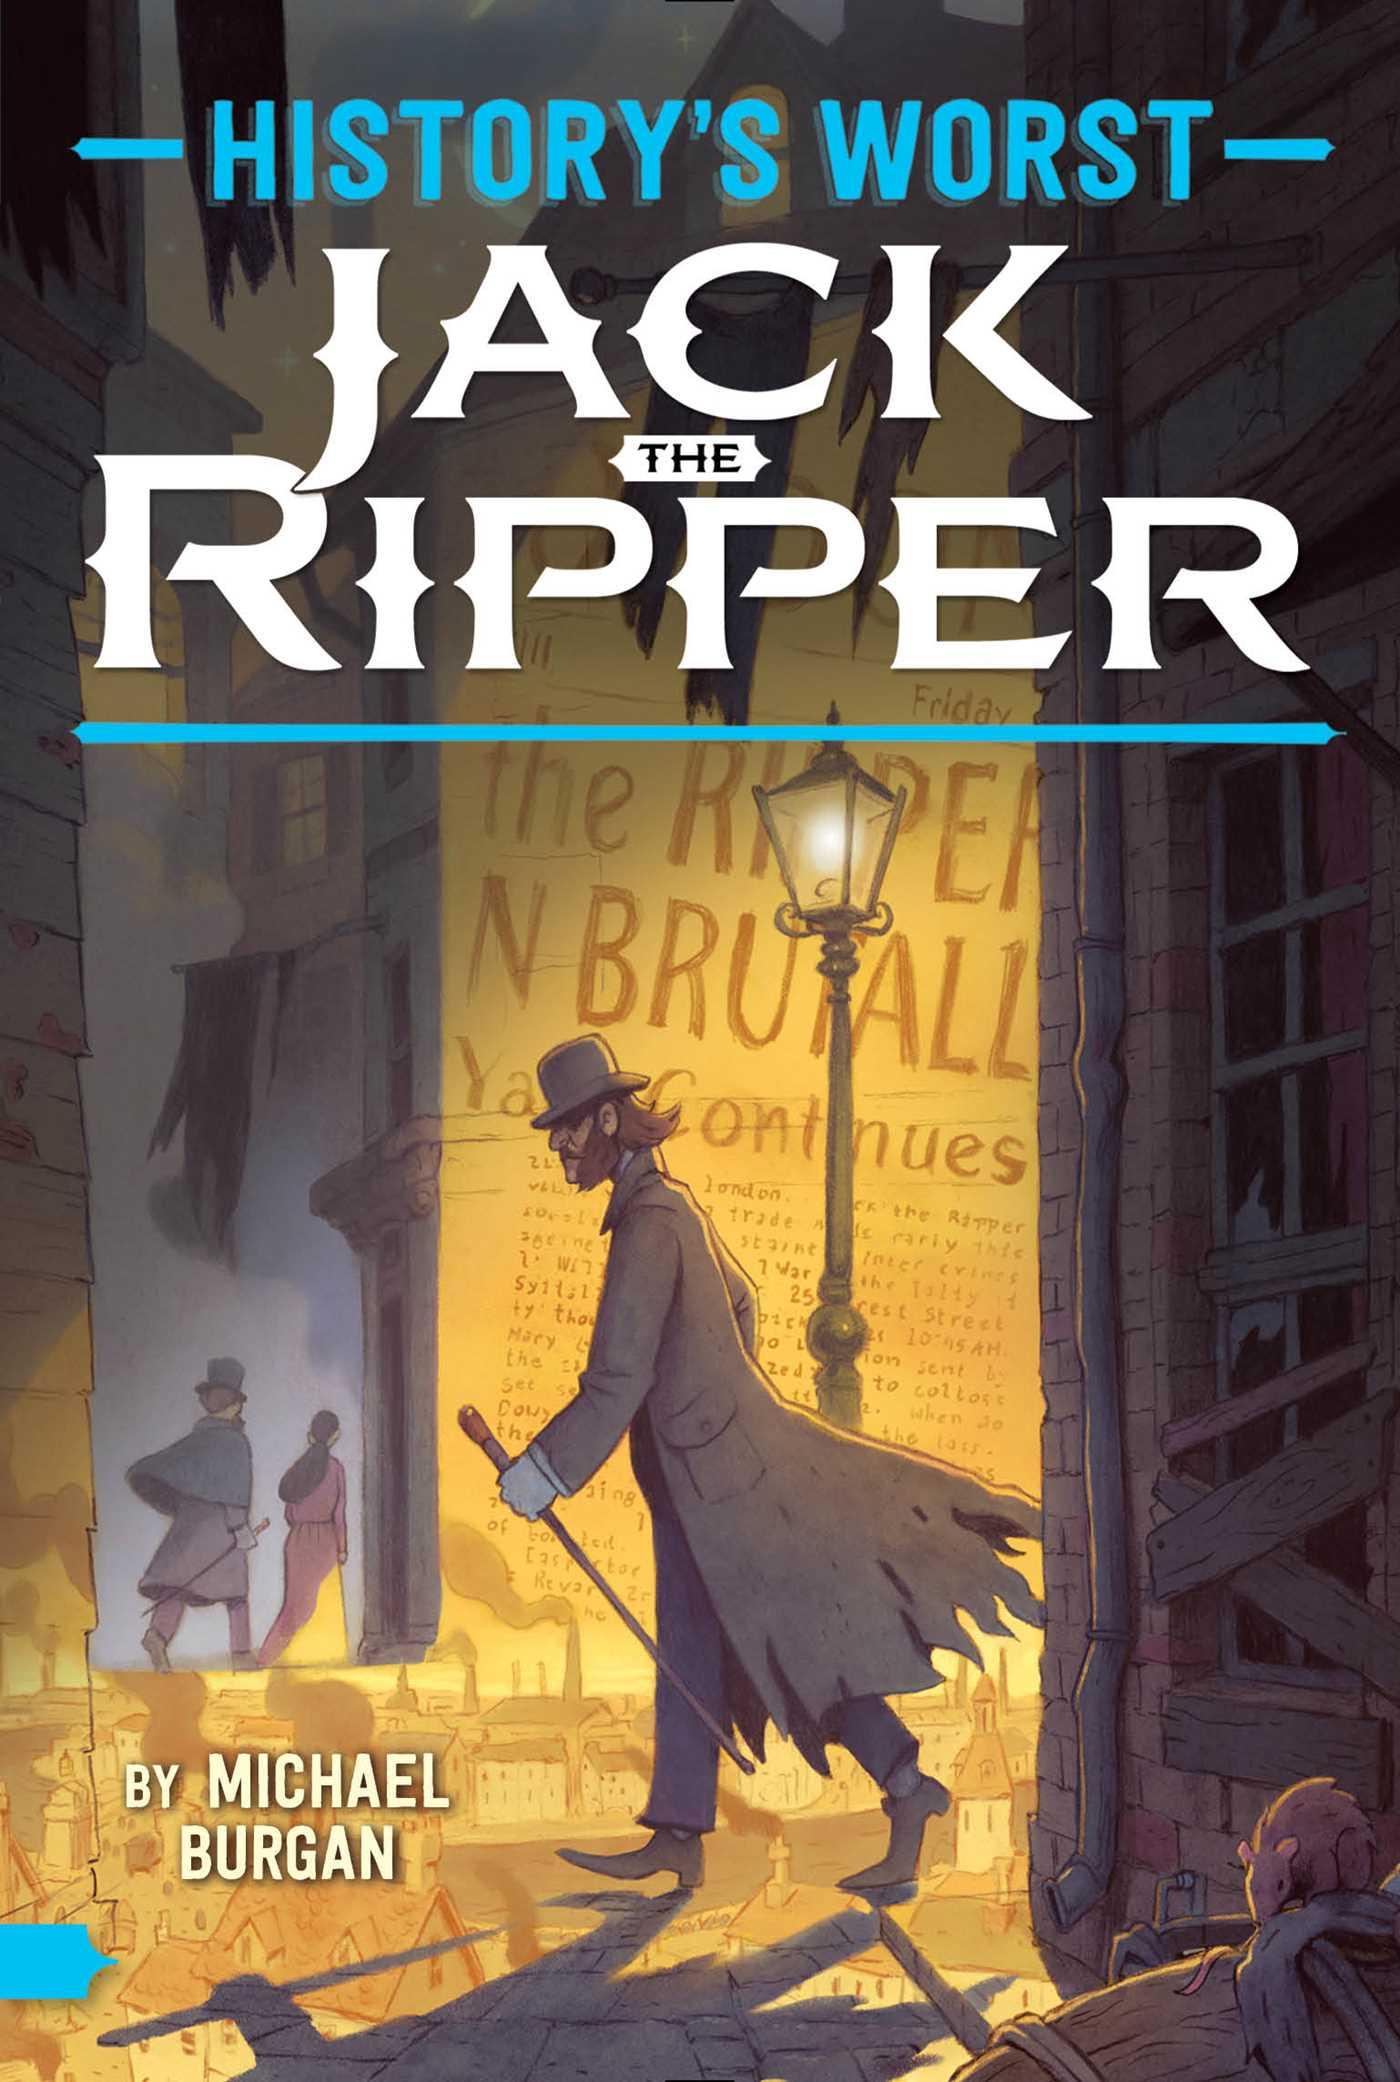 Jack the ripper 9781481479448 hr